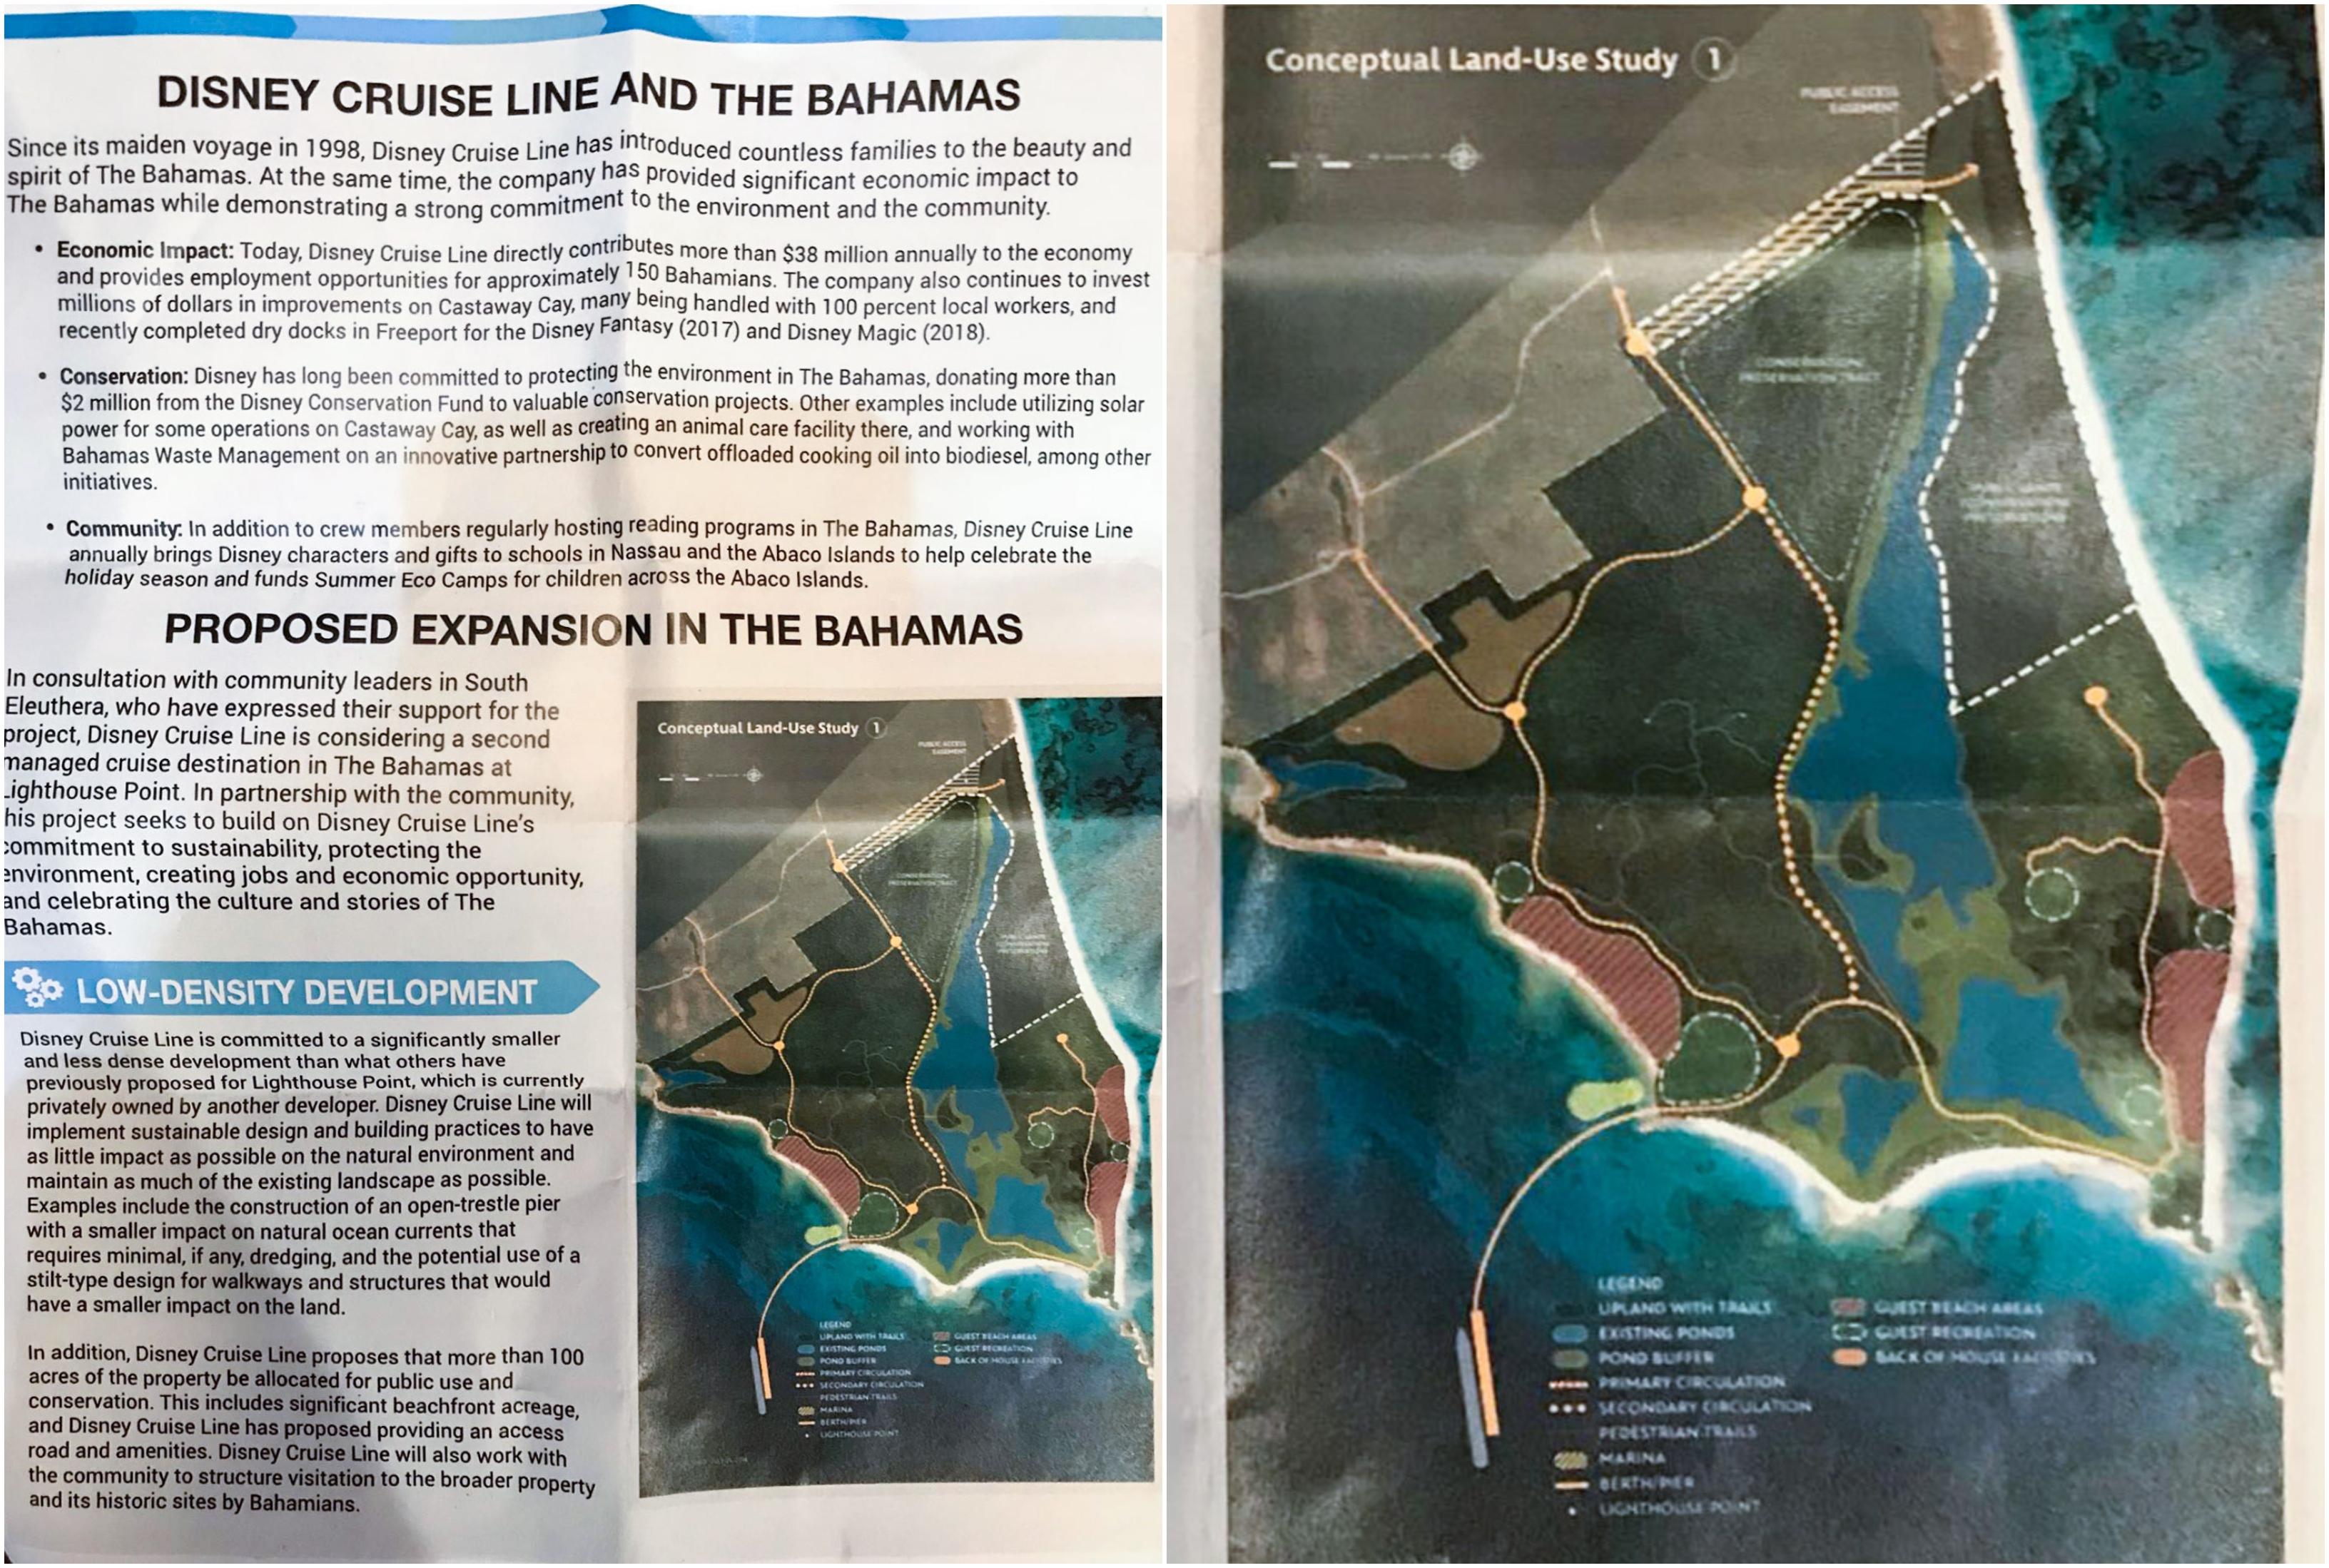 A New Disney Cruise Port Might be Coming to Eleuthera- Exuma